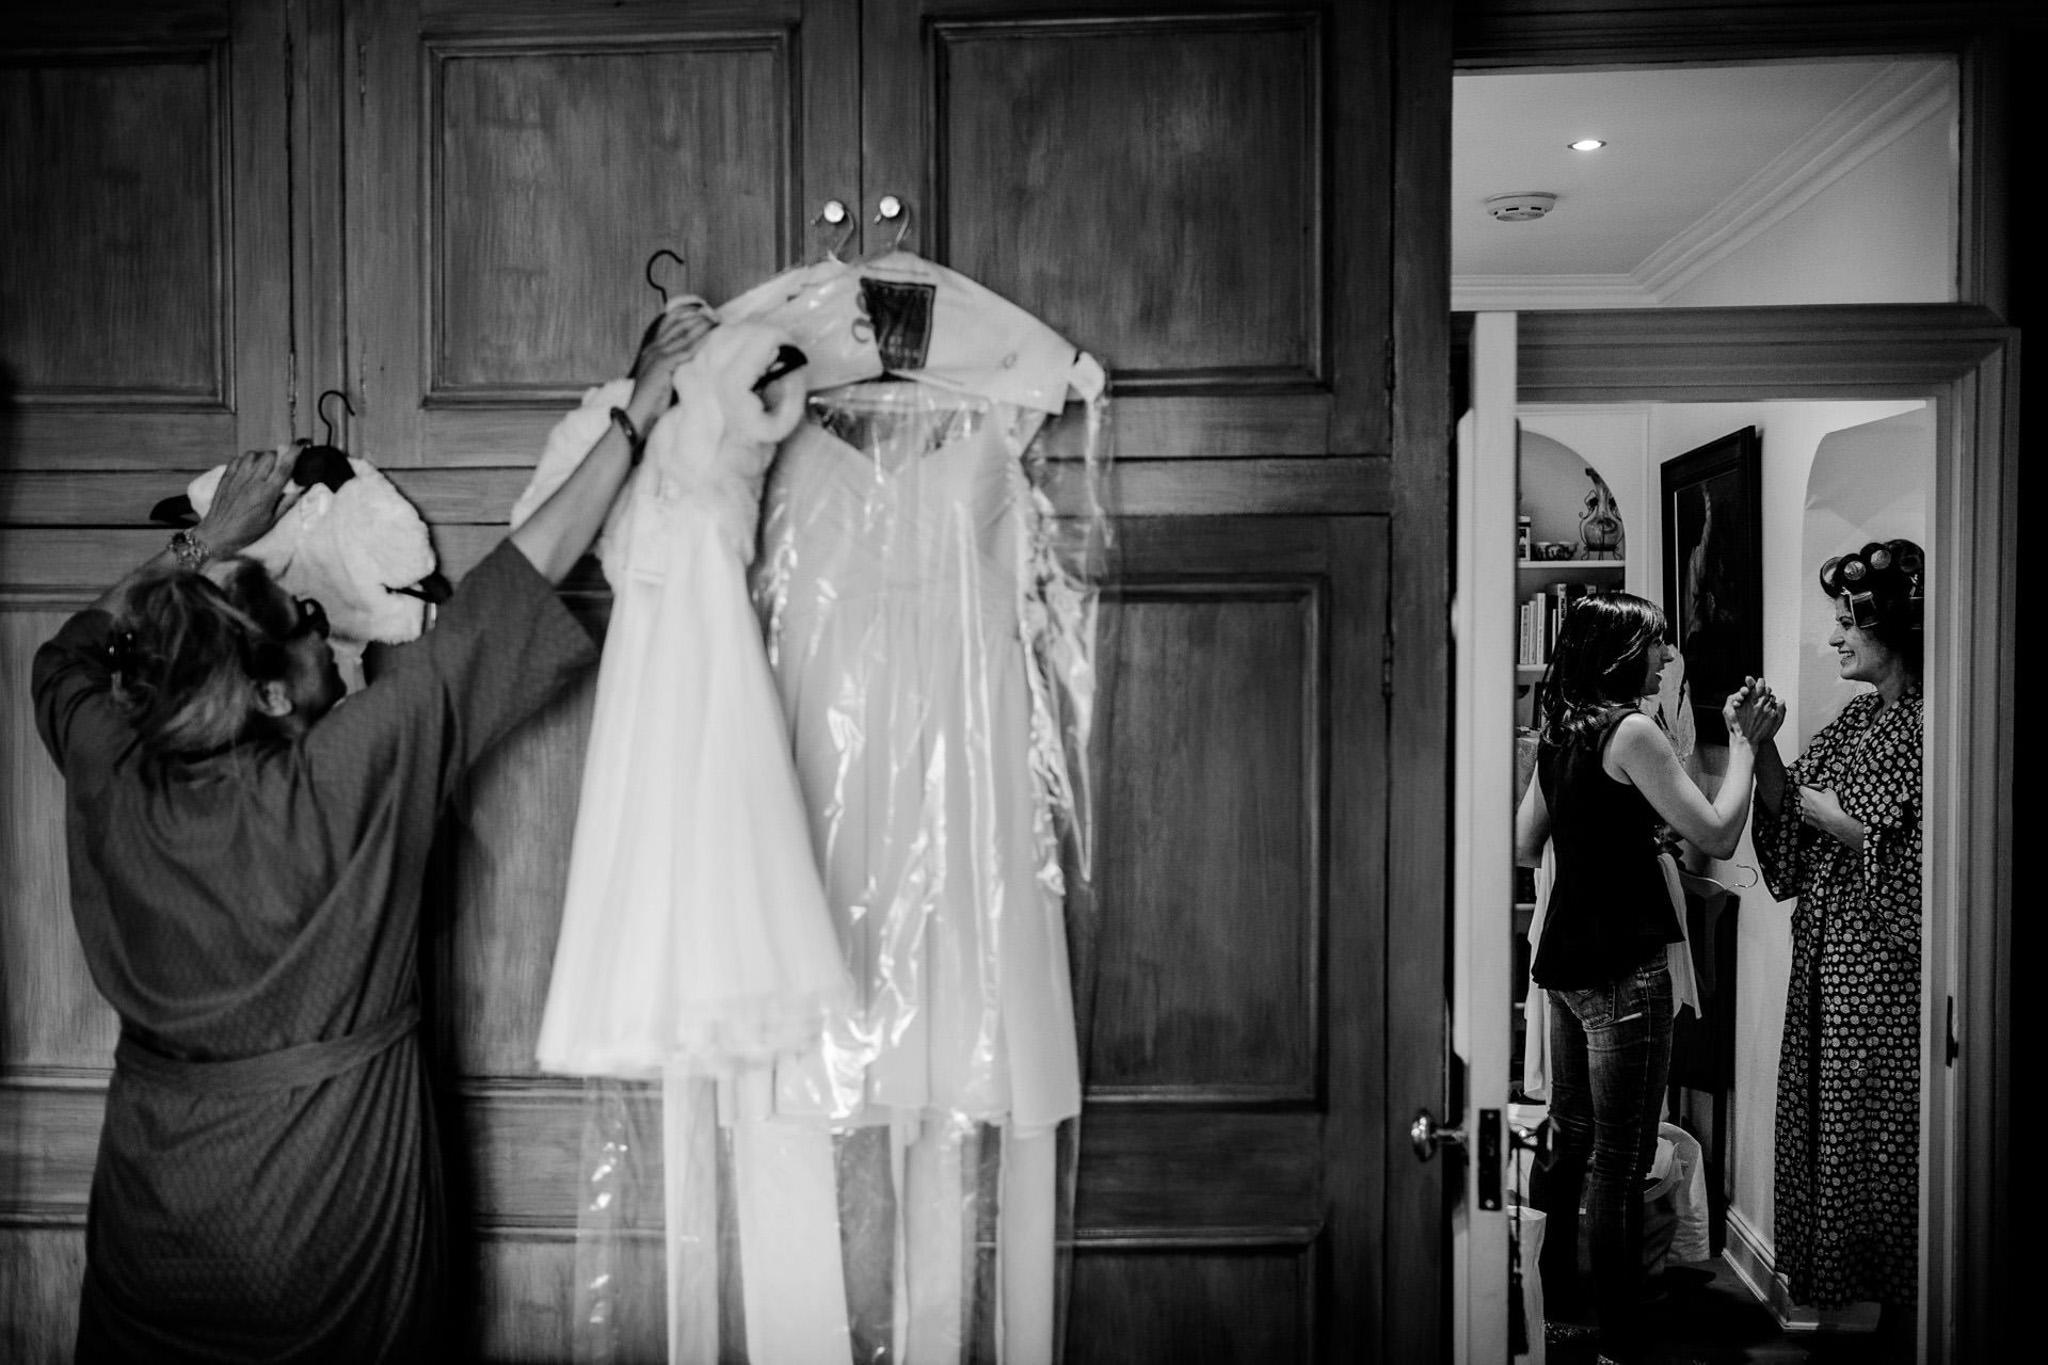 St. Pancras Renaissance hotel wedding bride in the room